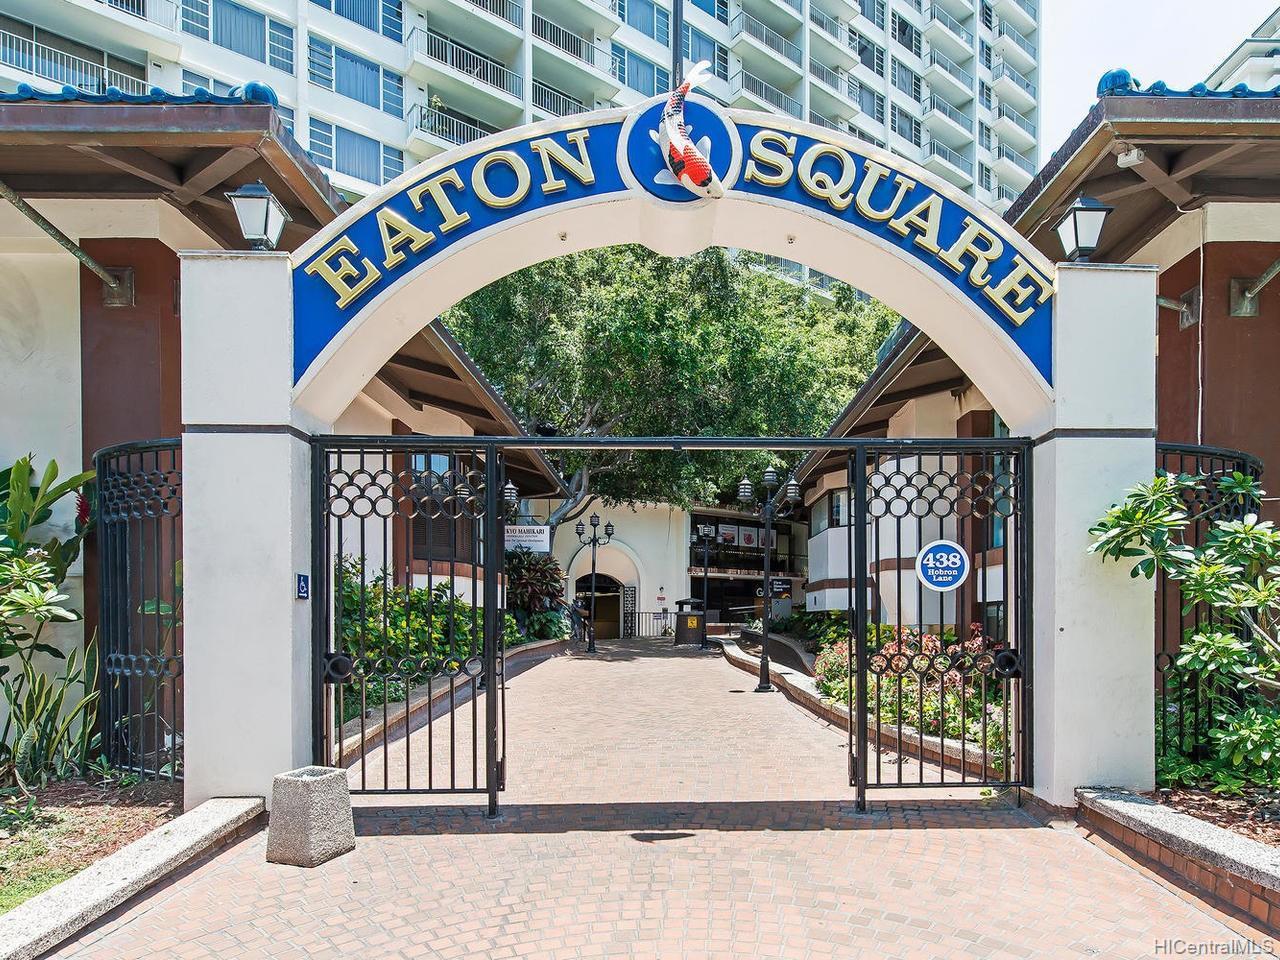 Villa On Eaton Square condo # 2801, Honolulu, Hawaii - photo 14 of 24